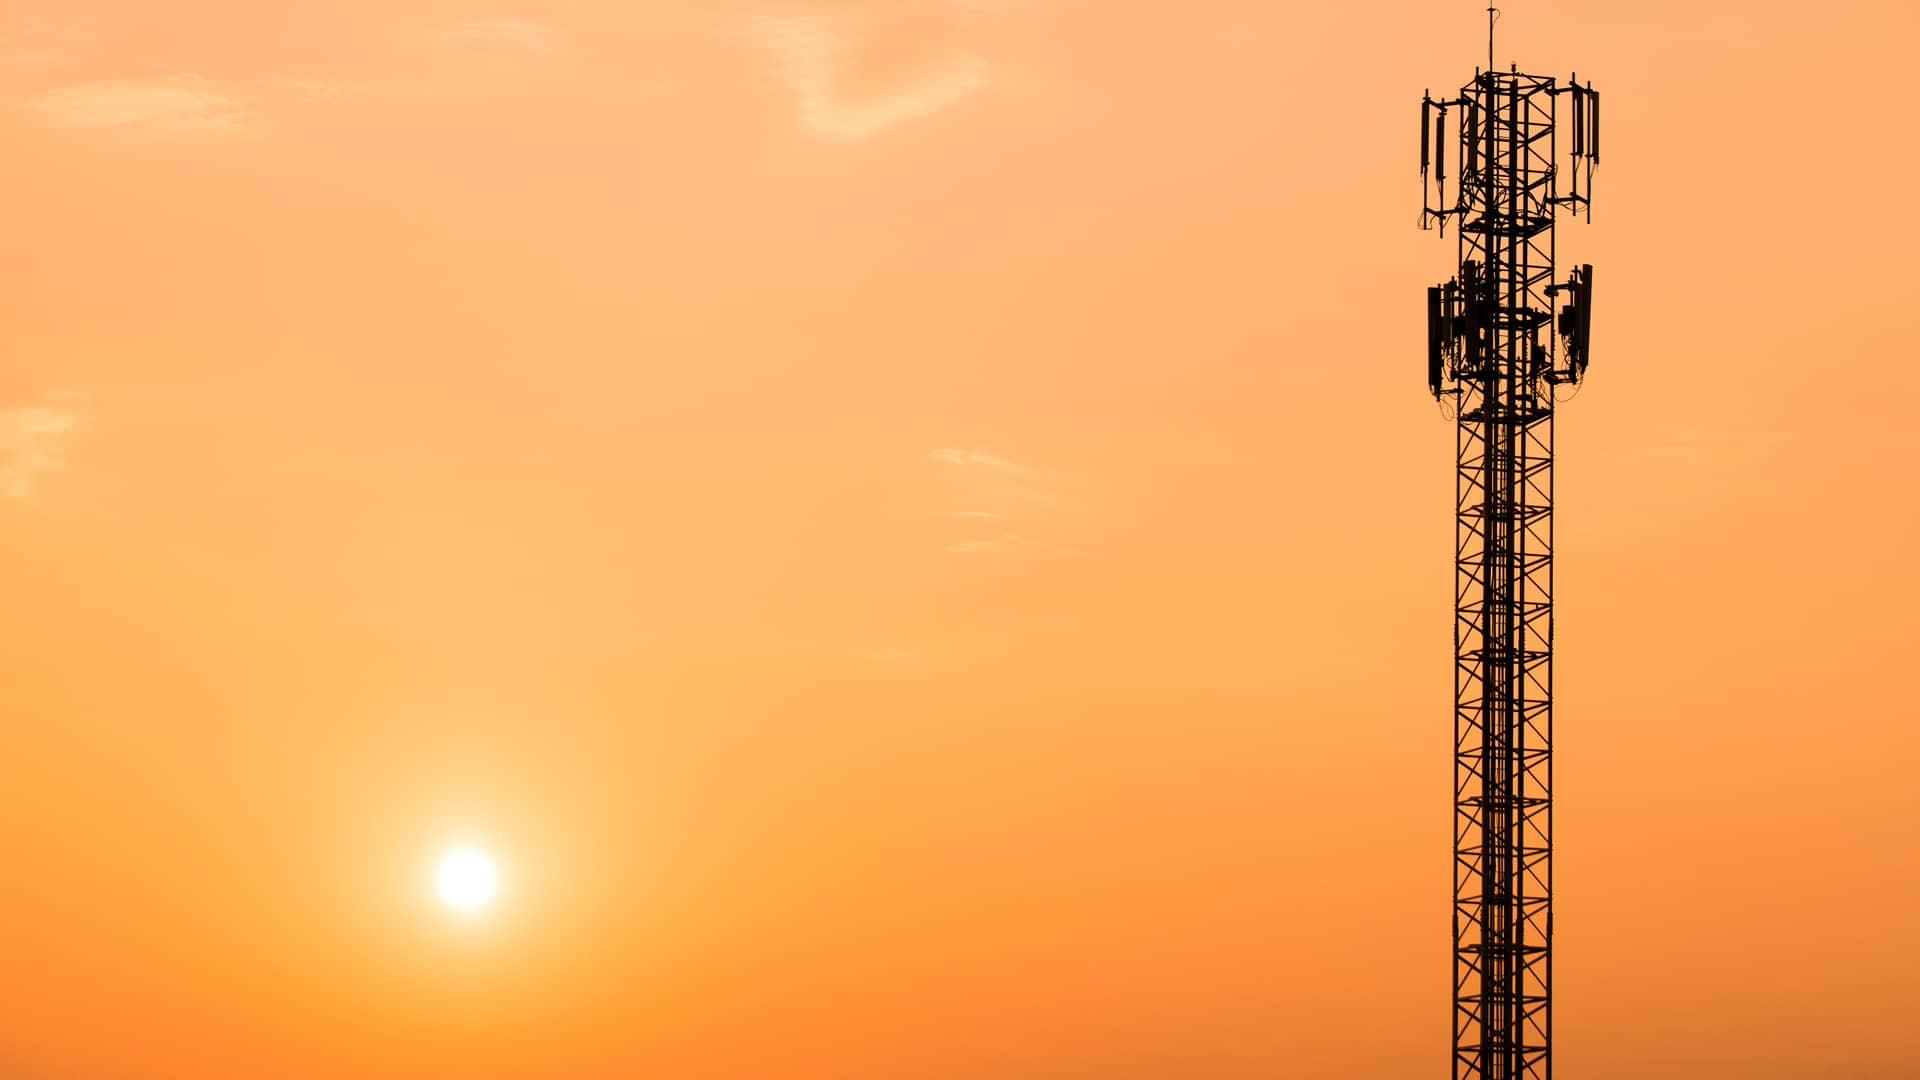 Antena de telefonía simboliza cobertura 5g de simyo